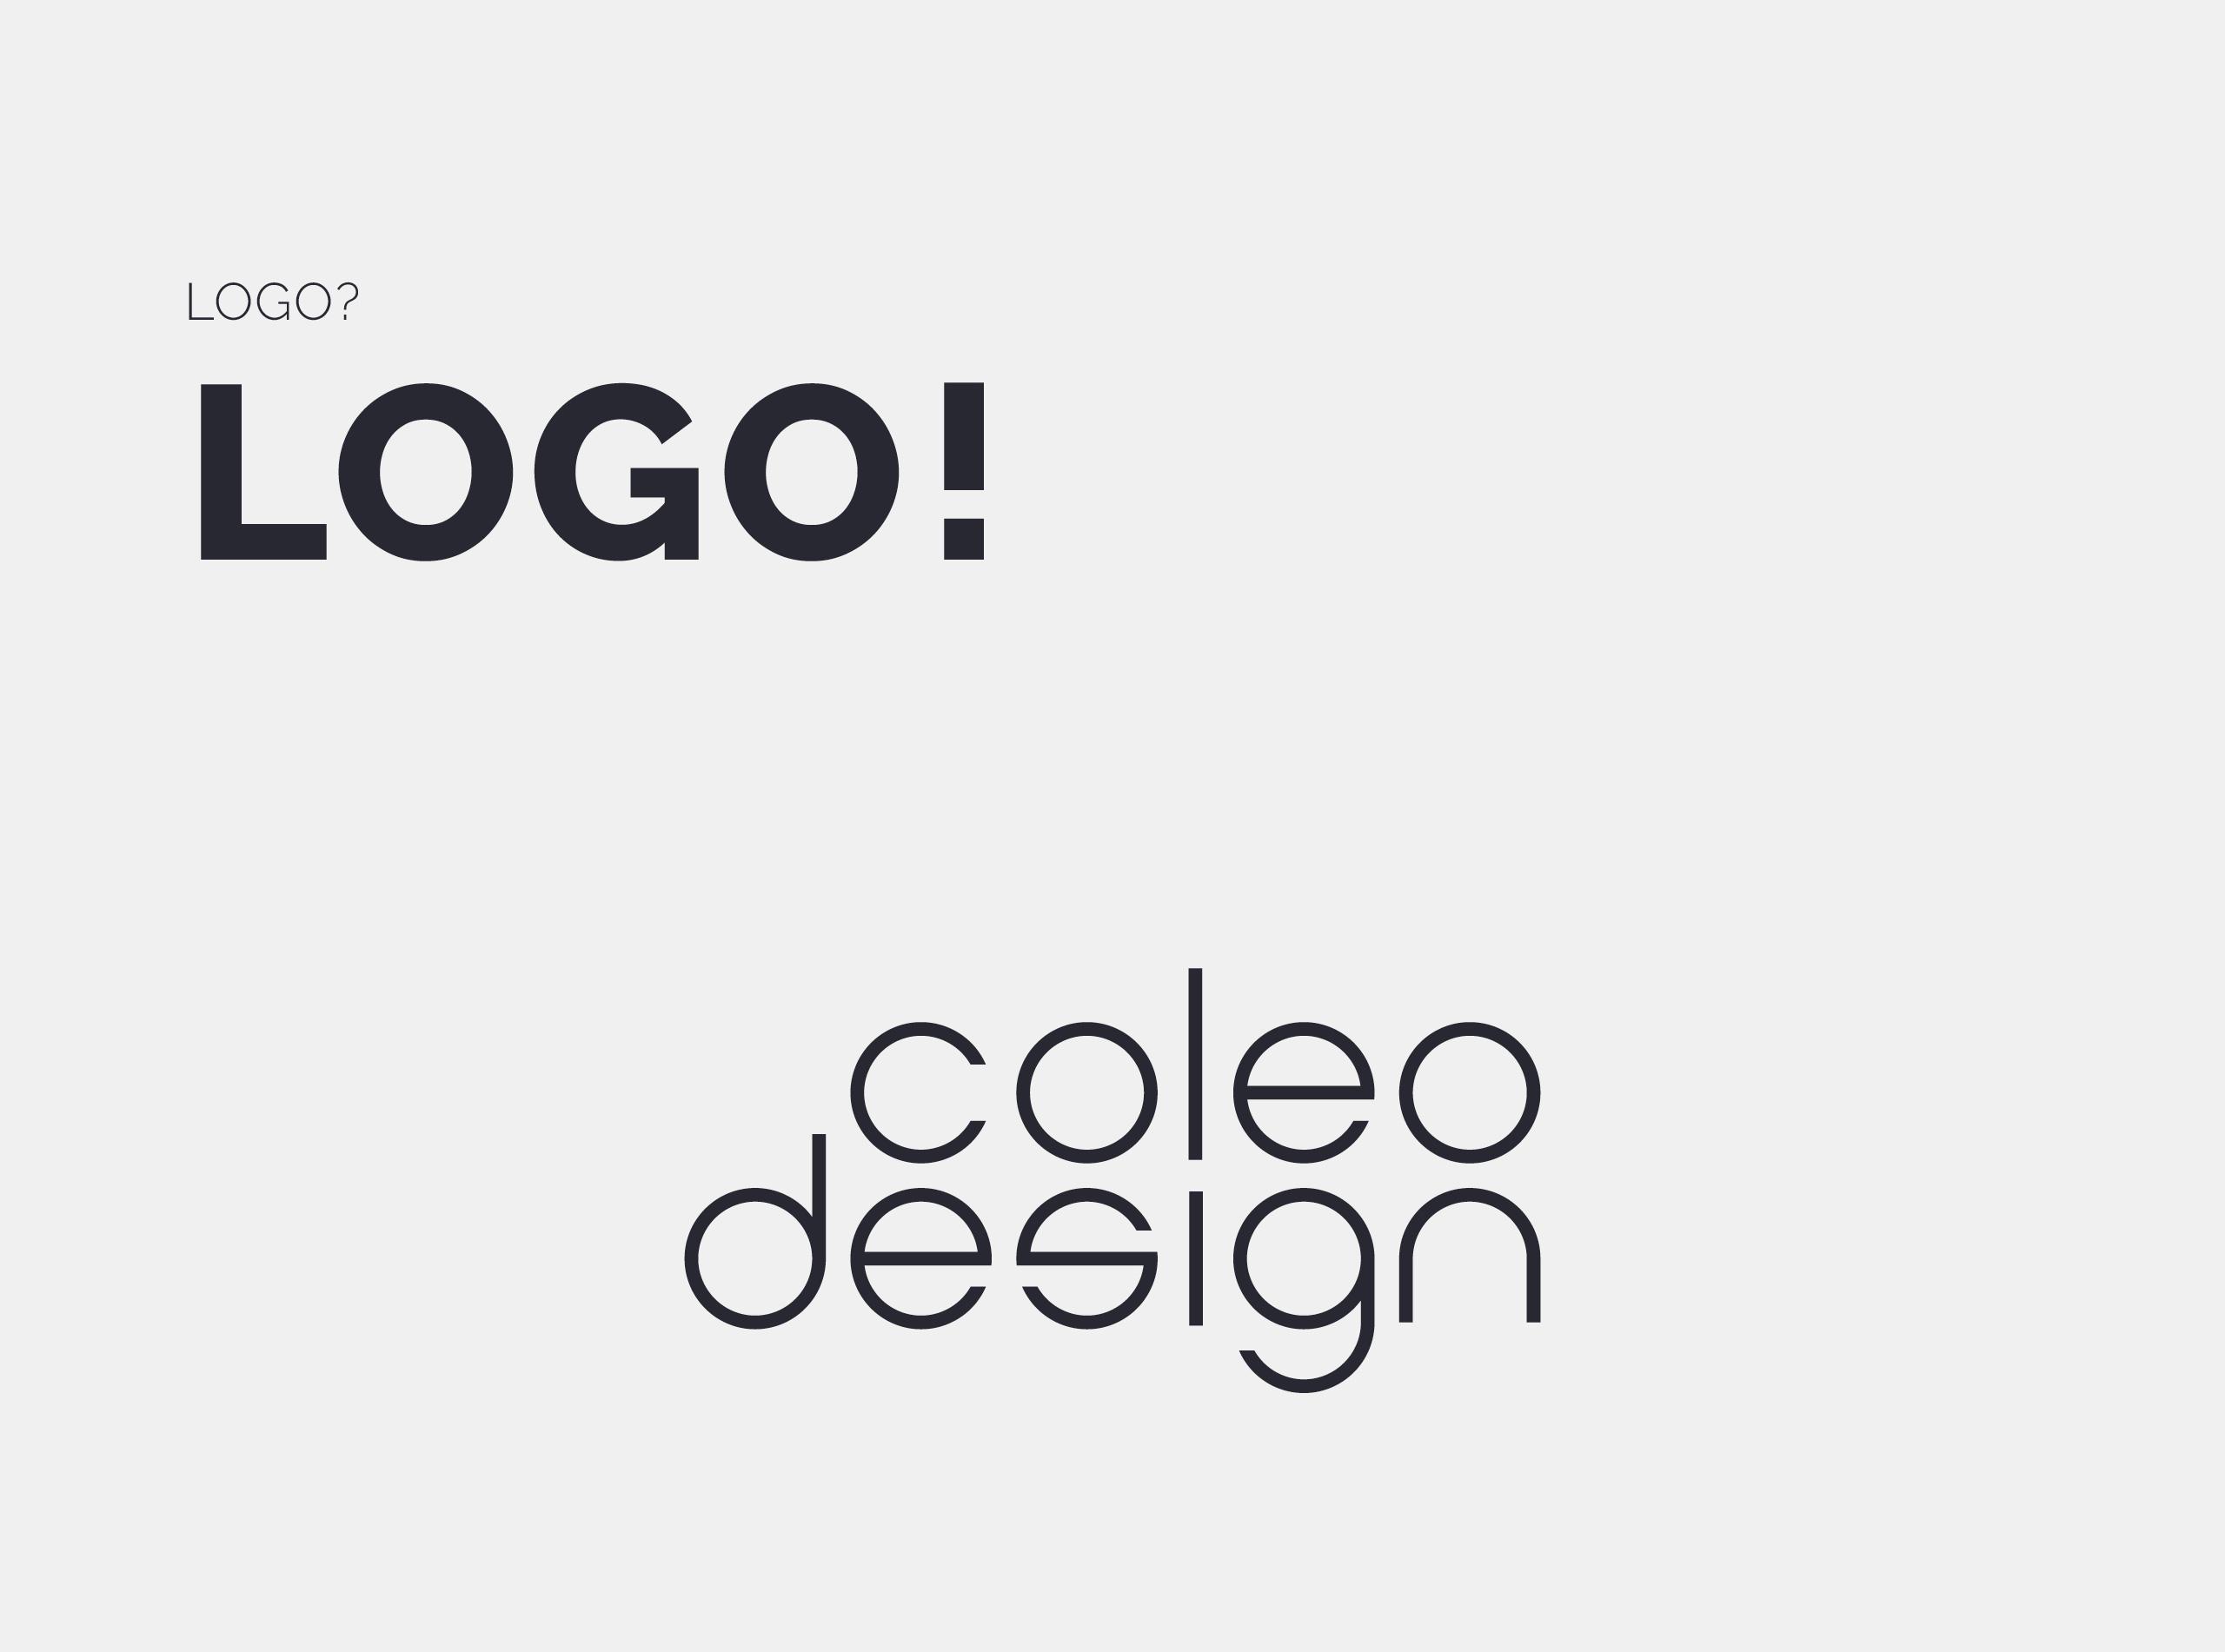 coleo design 7